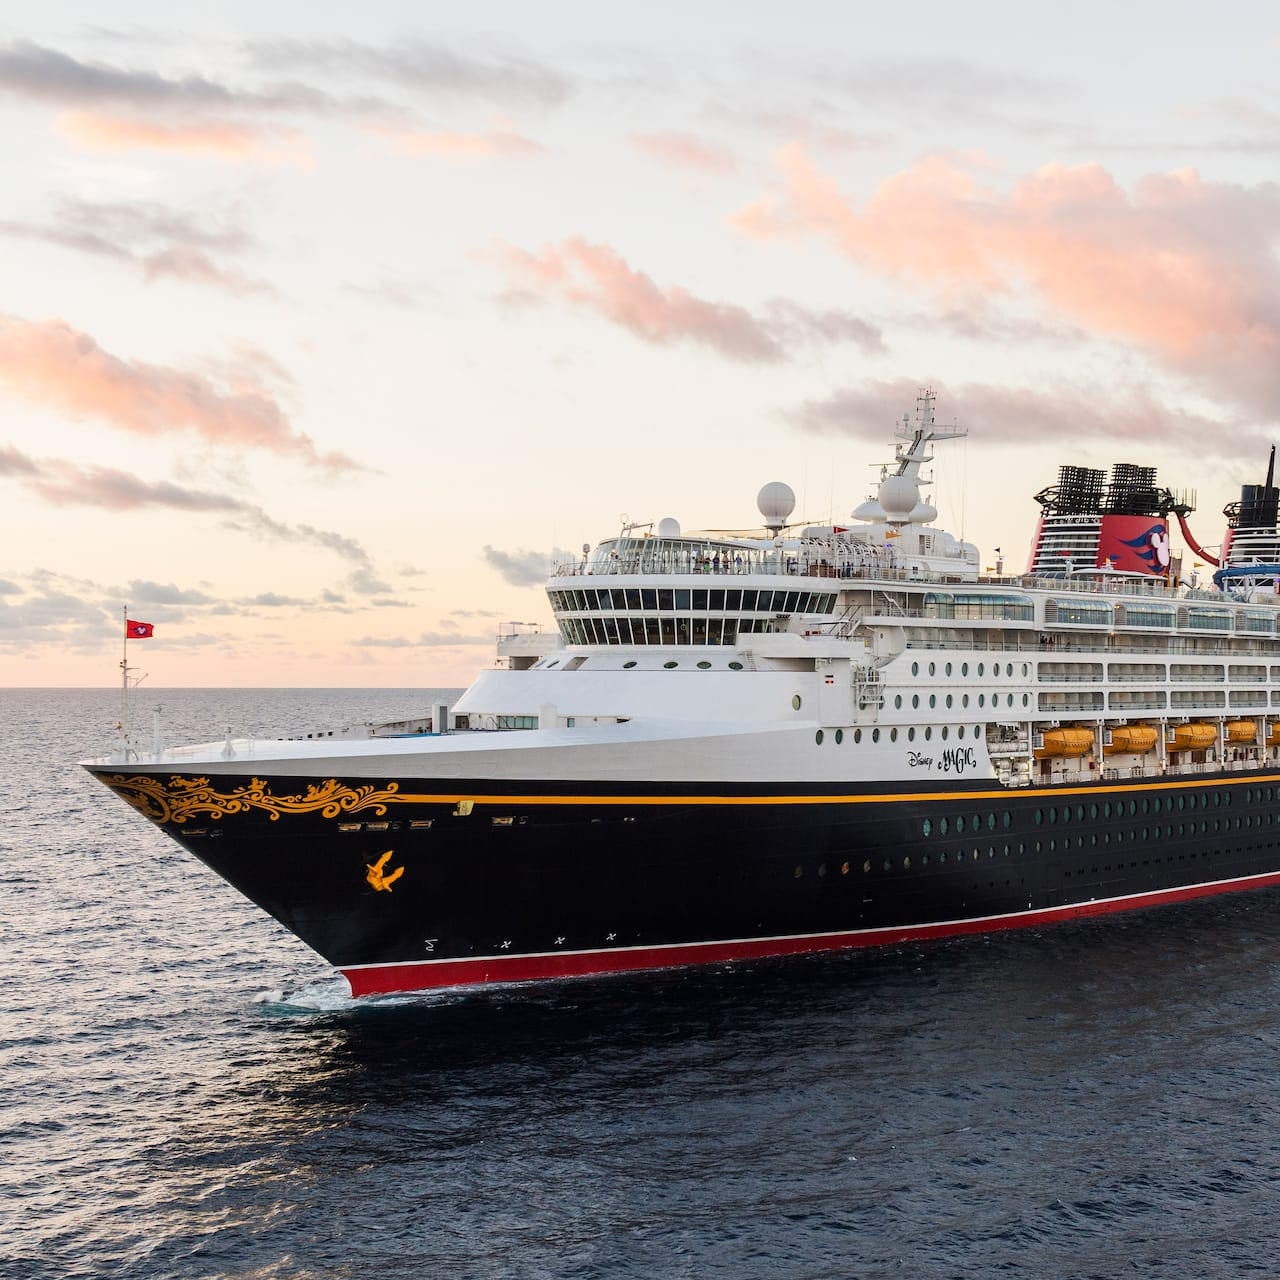 The Disney Magic cruise ship sails the sea beneath a cloudy sky